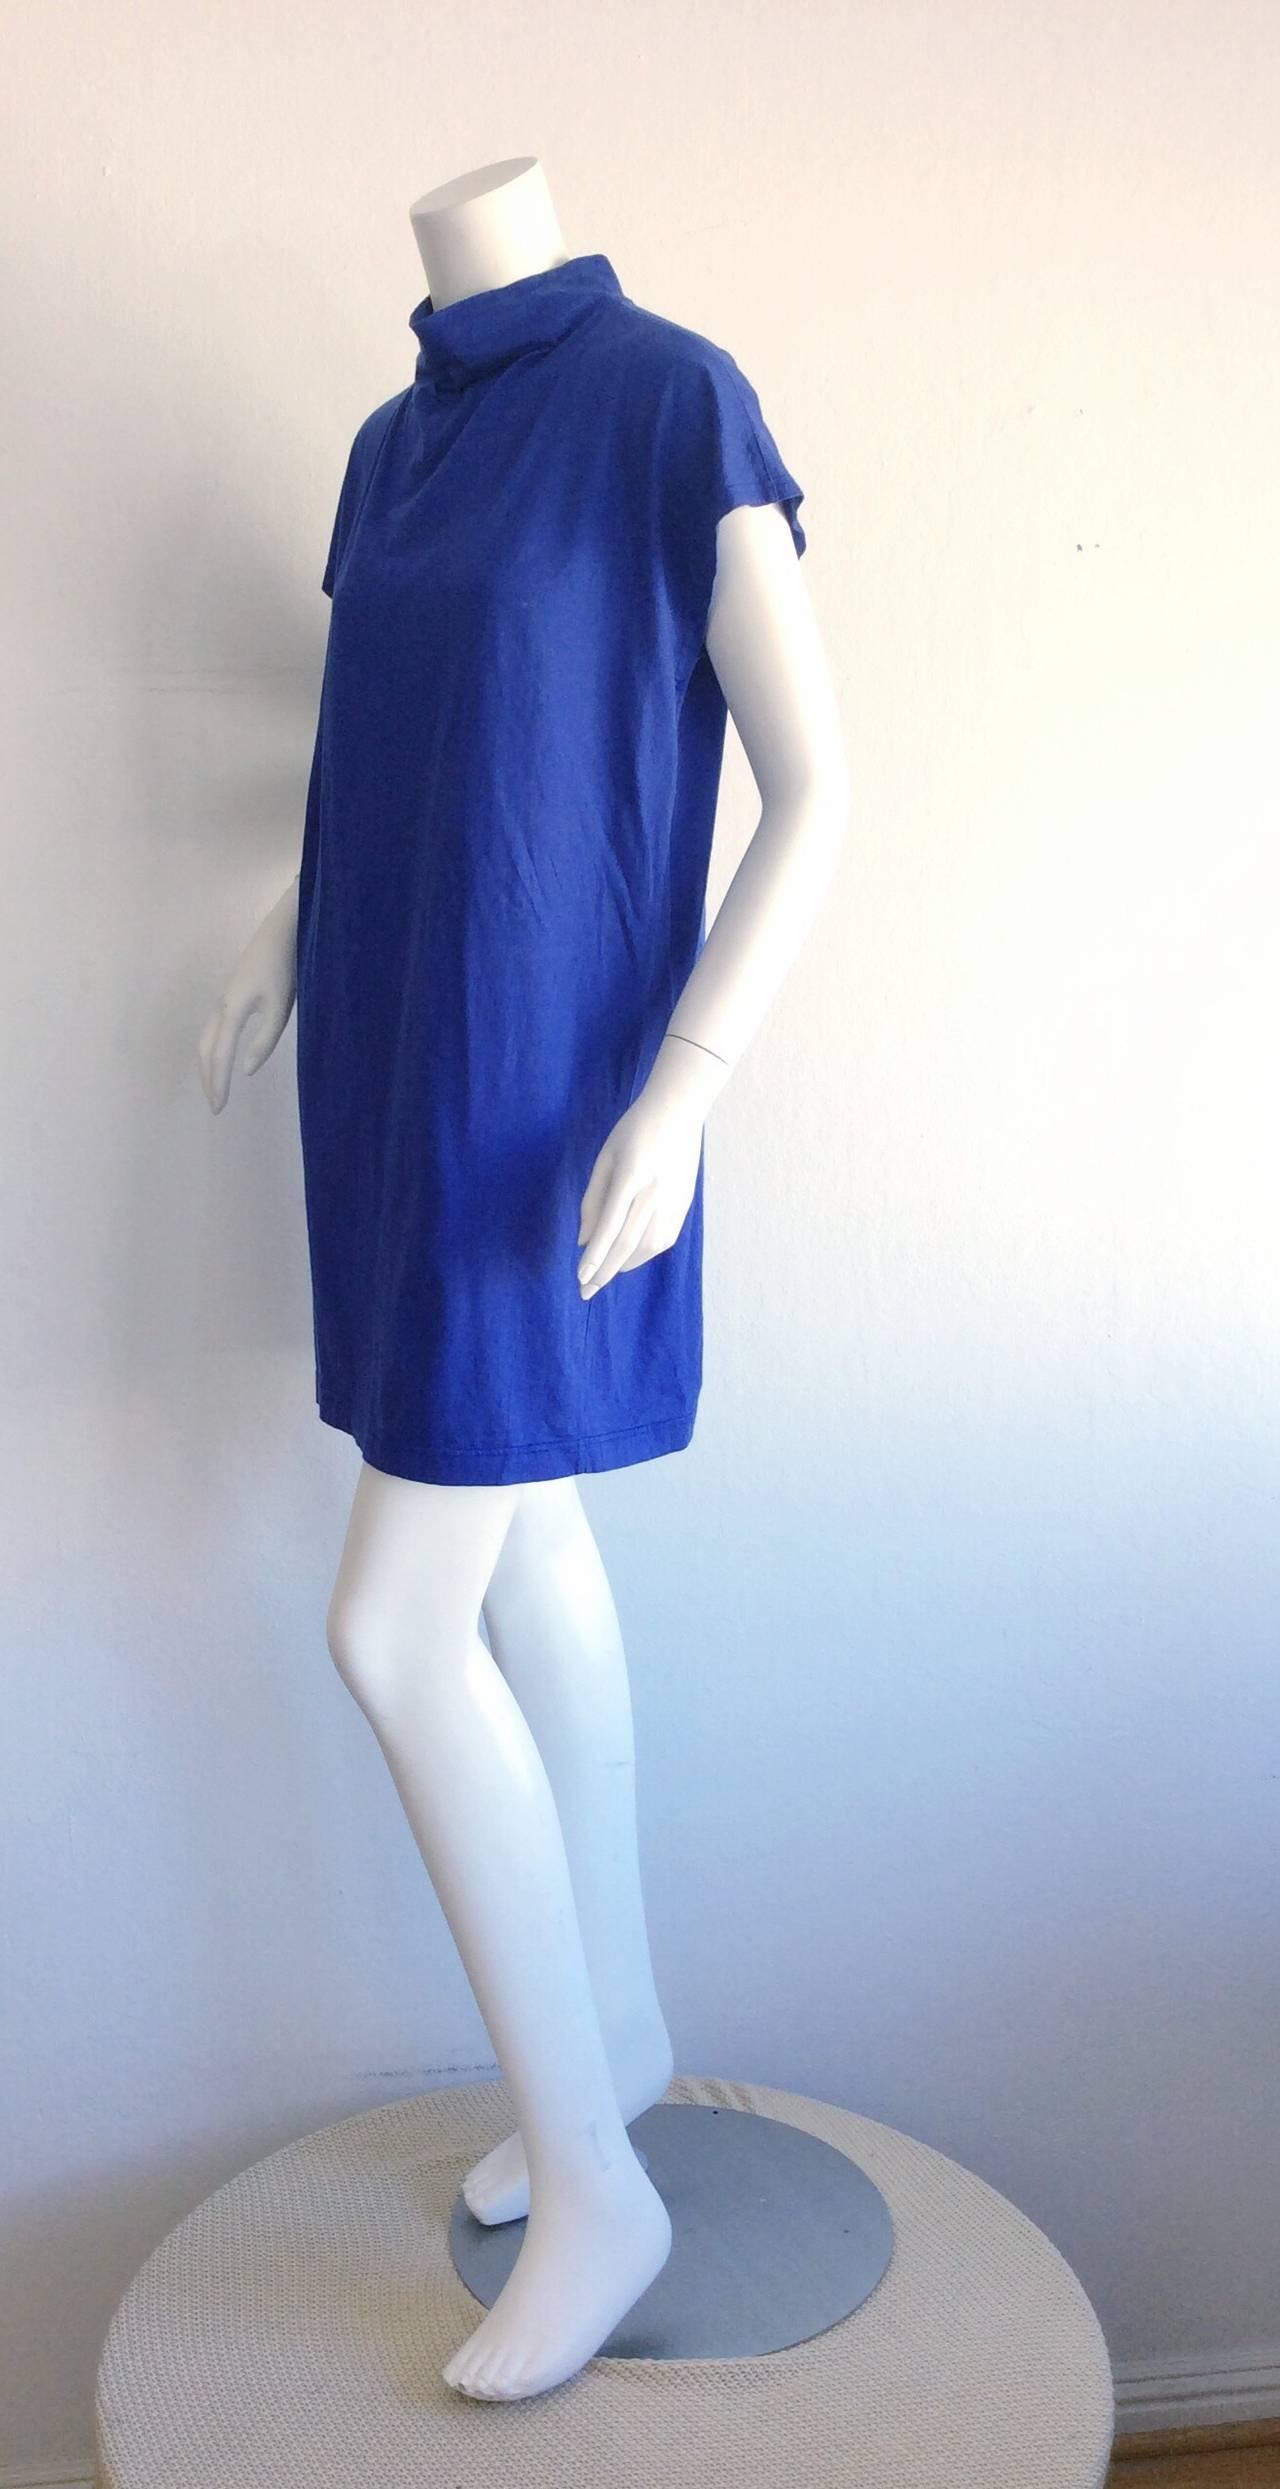 Rare vintage issey miyake plantation royal blue smock cotton t shirt dress - Issey miyake rue royale ...